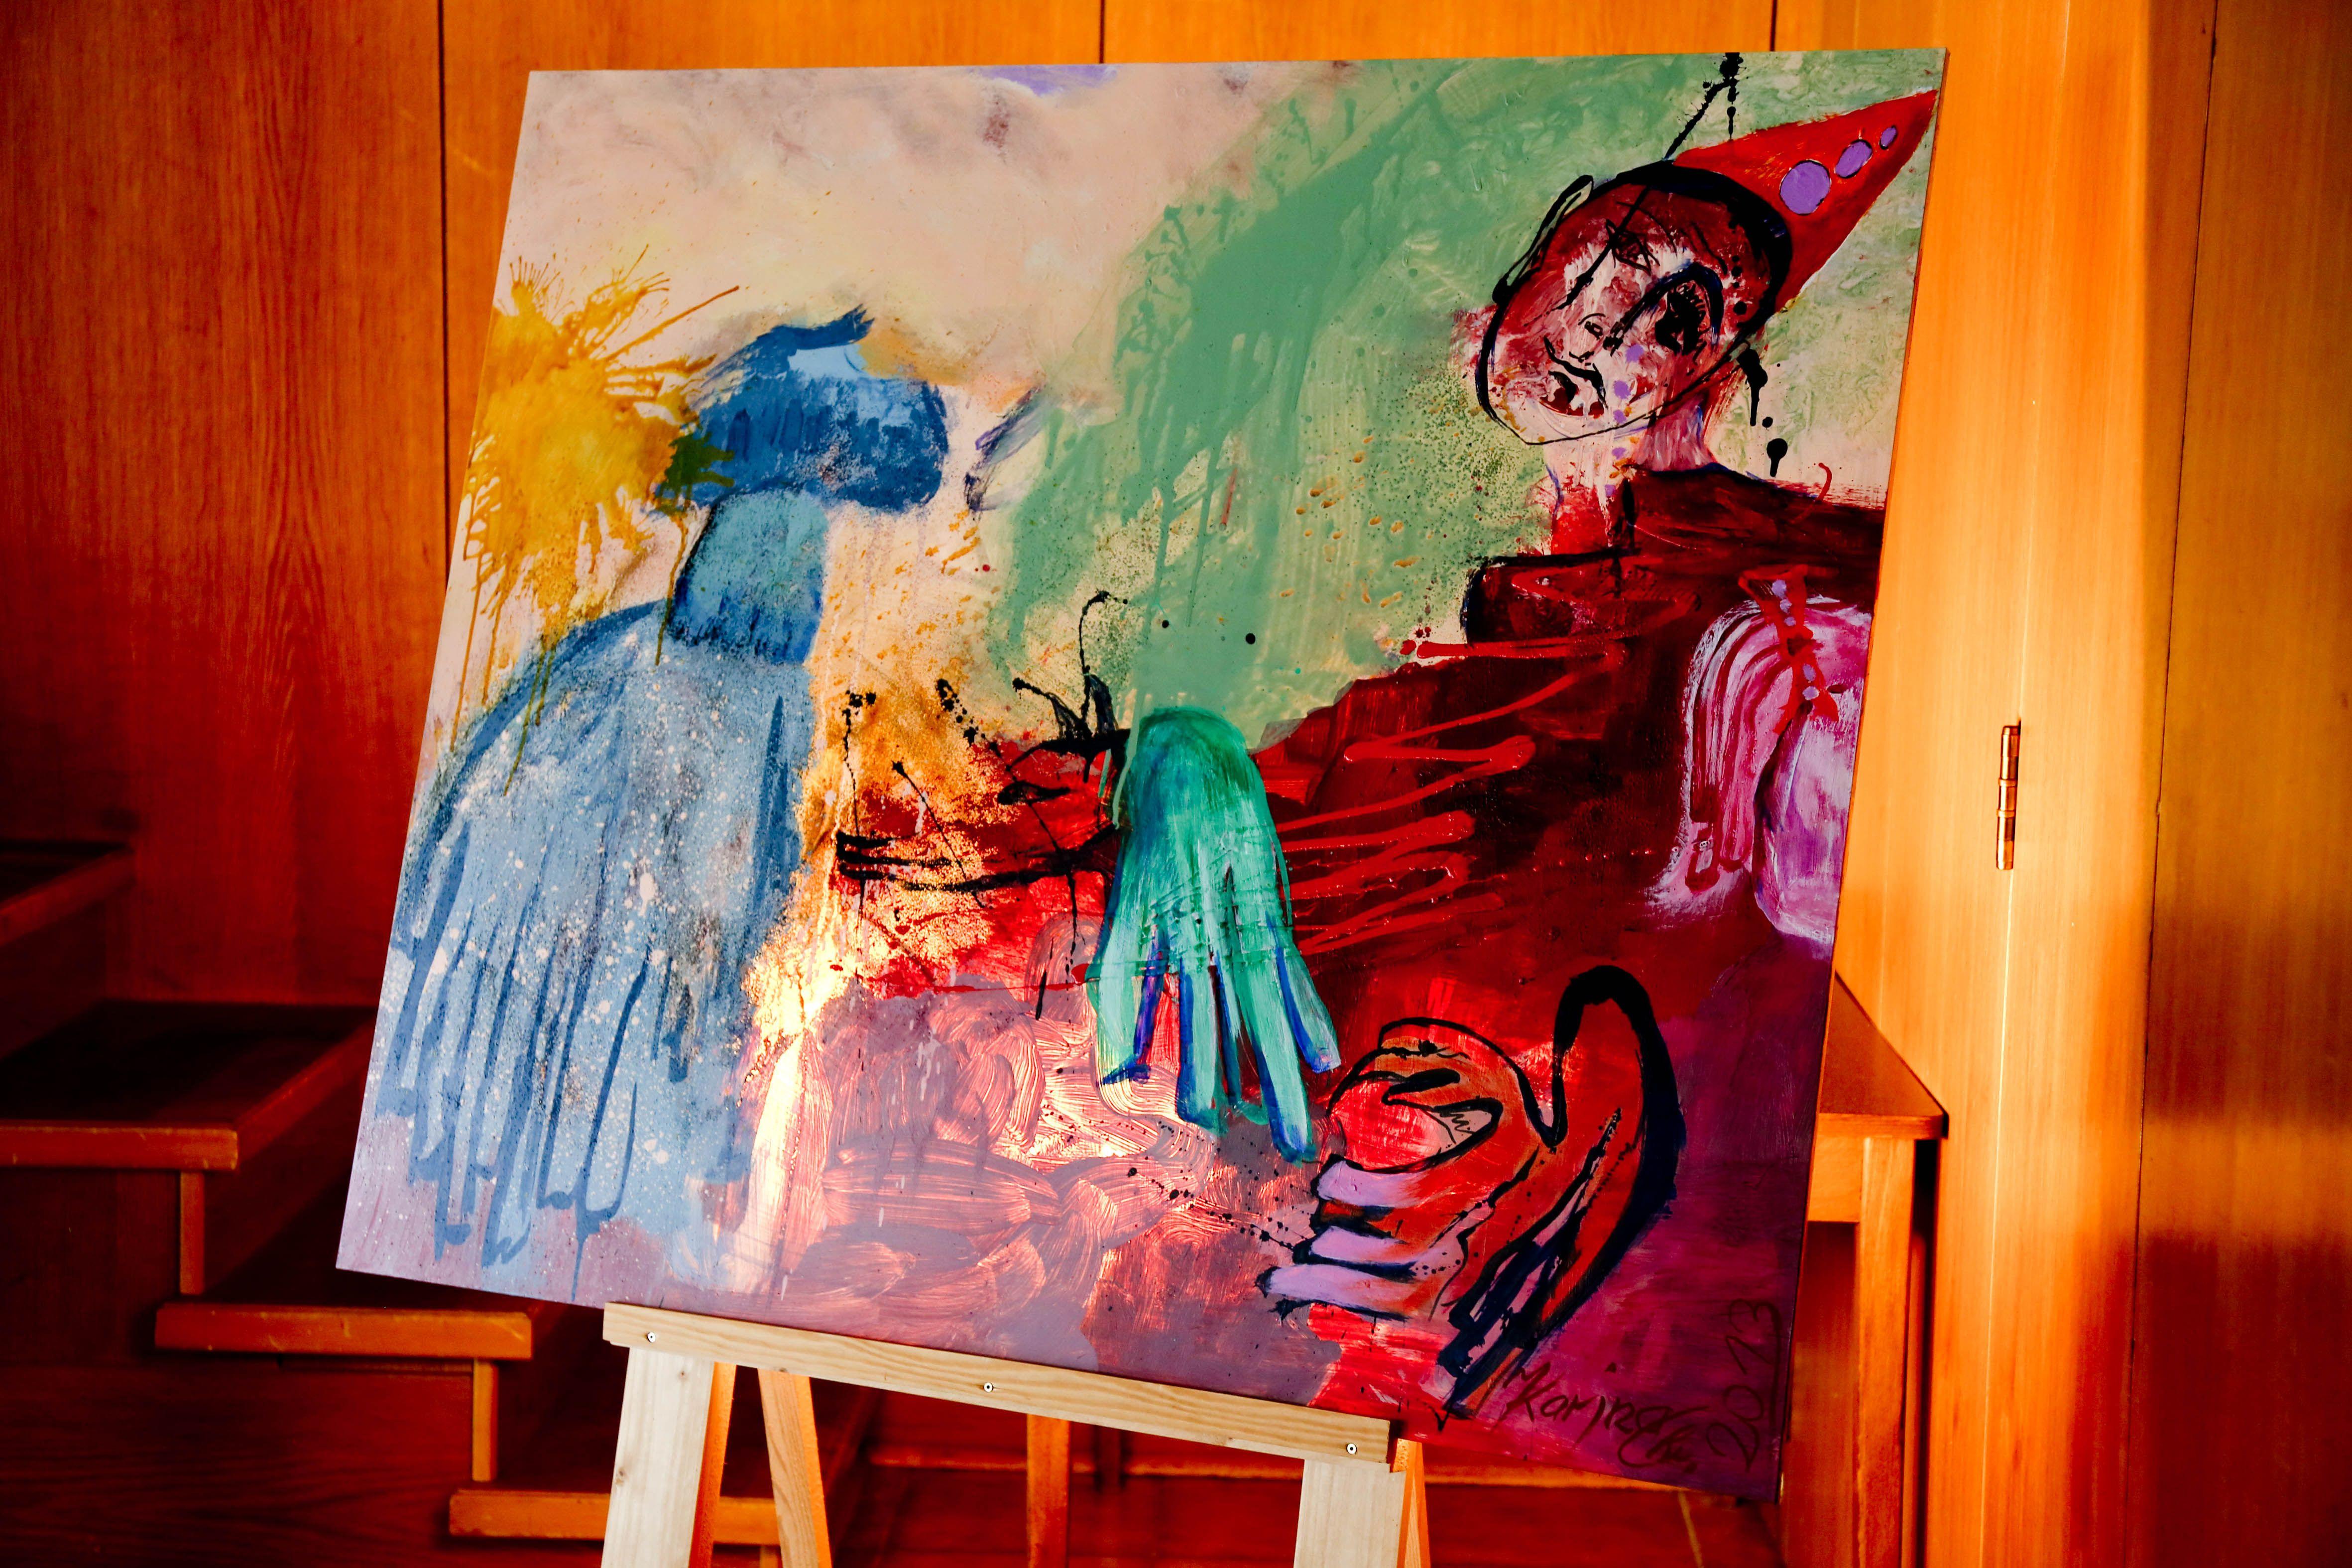 Kunstgalerie Karina im Hotel Zanker